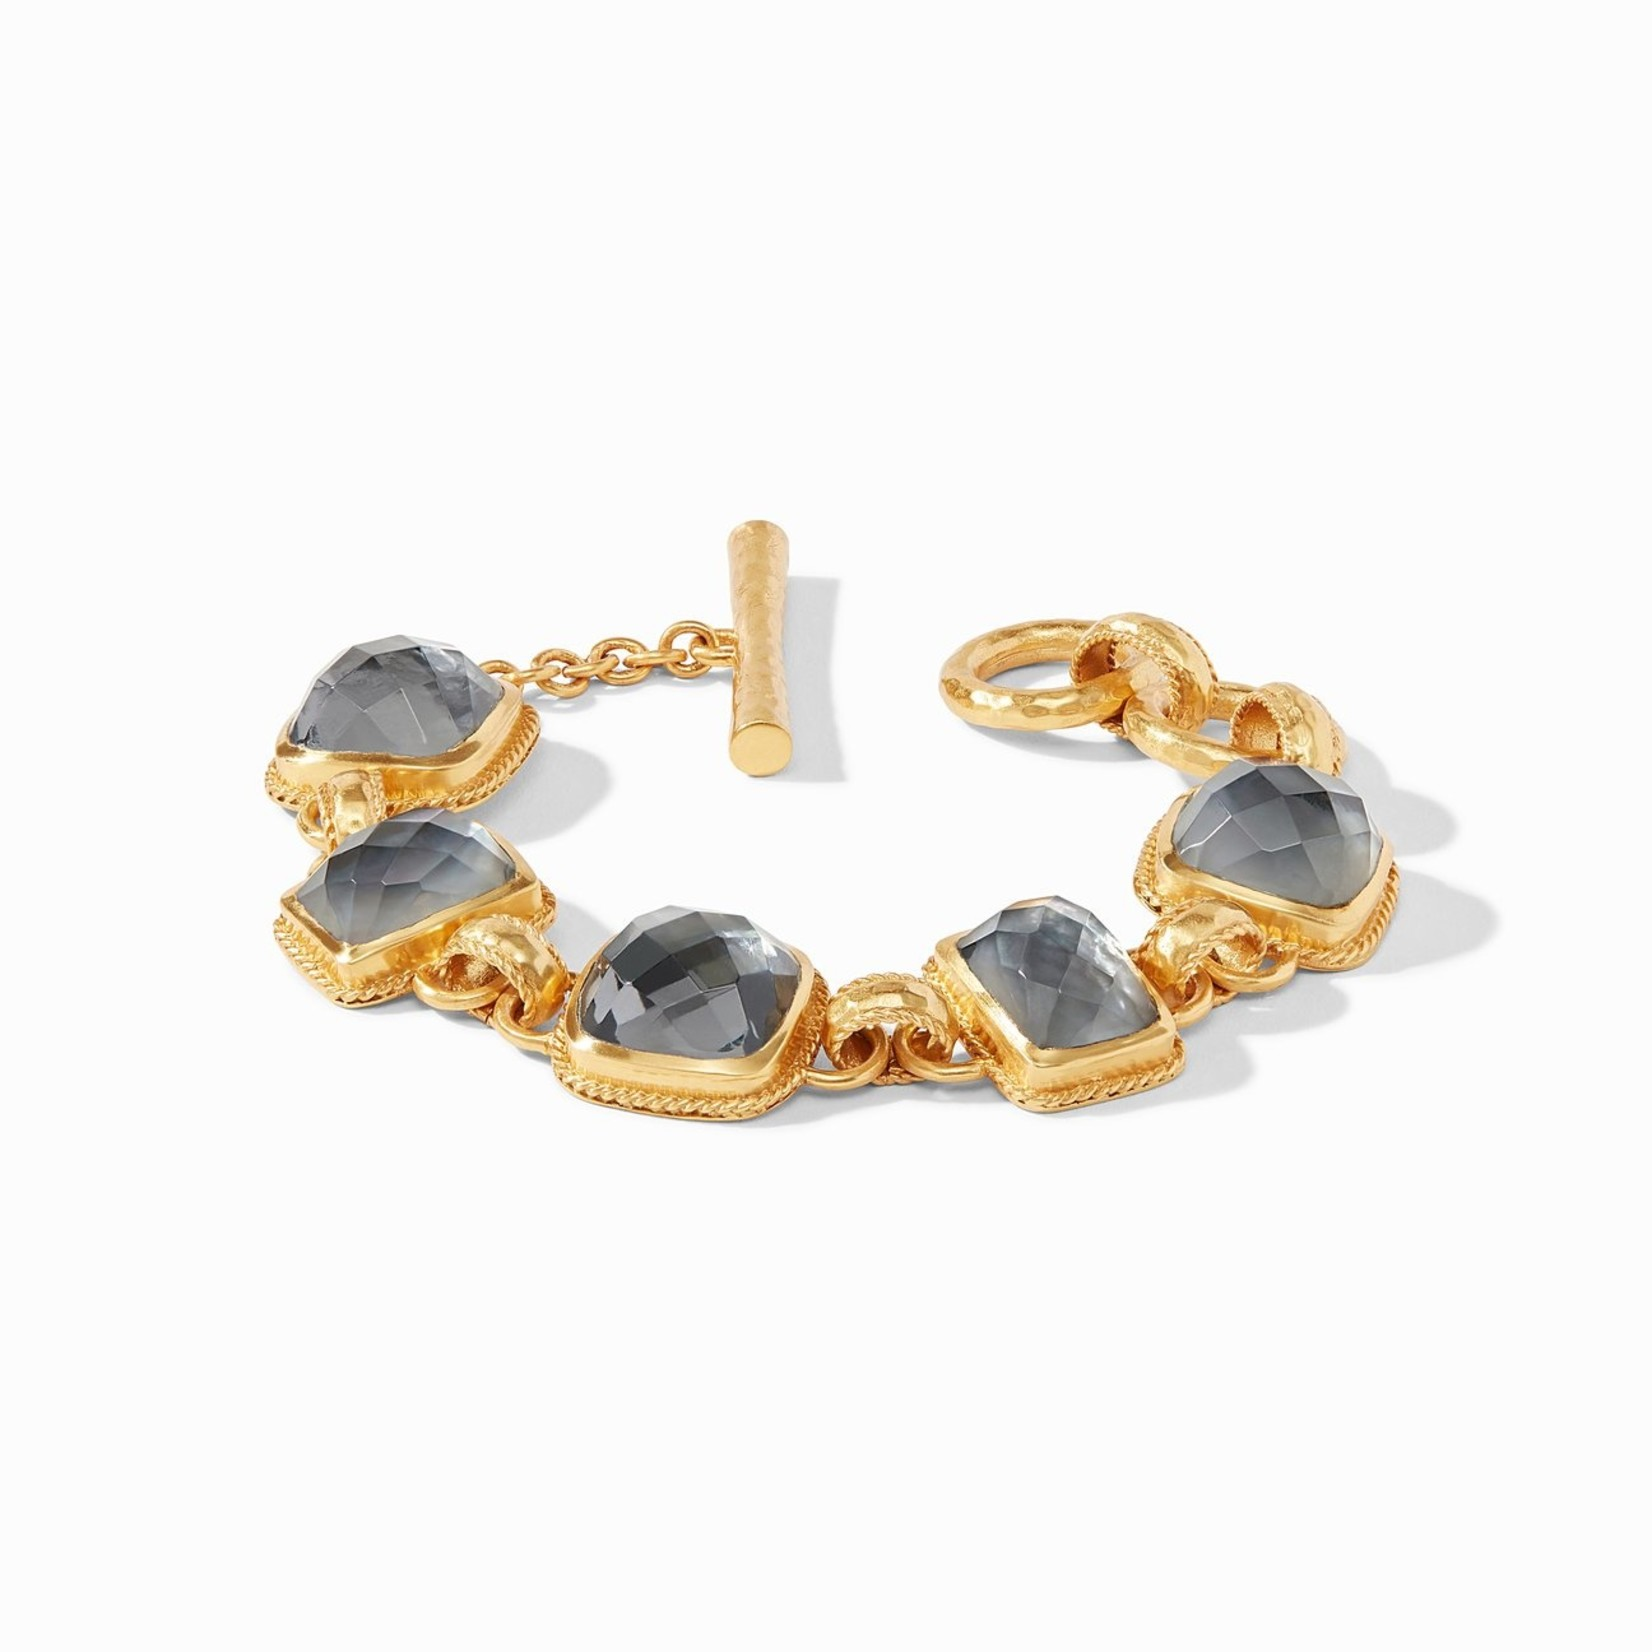 Julie Vos Savoy Demi Bracelet - Iridescent Charcoal Blue